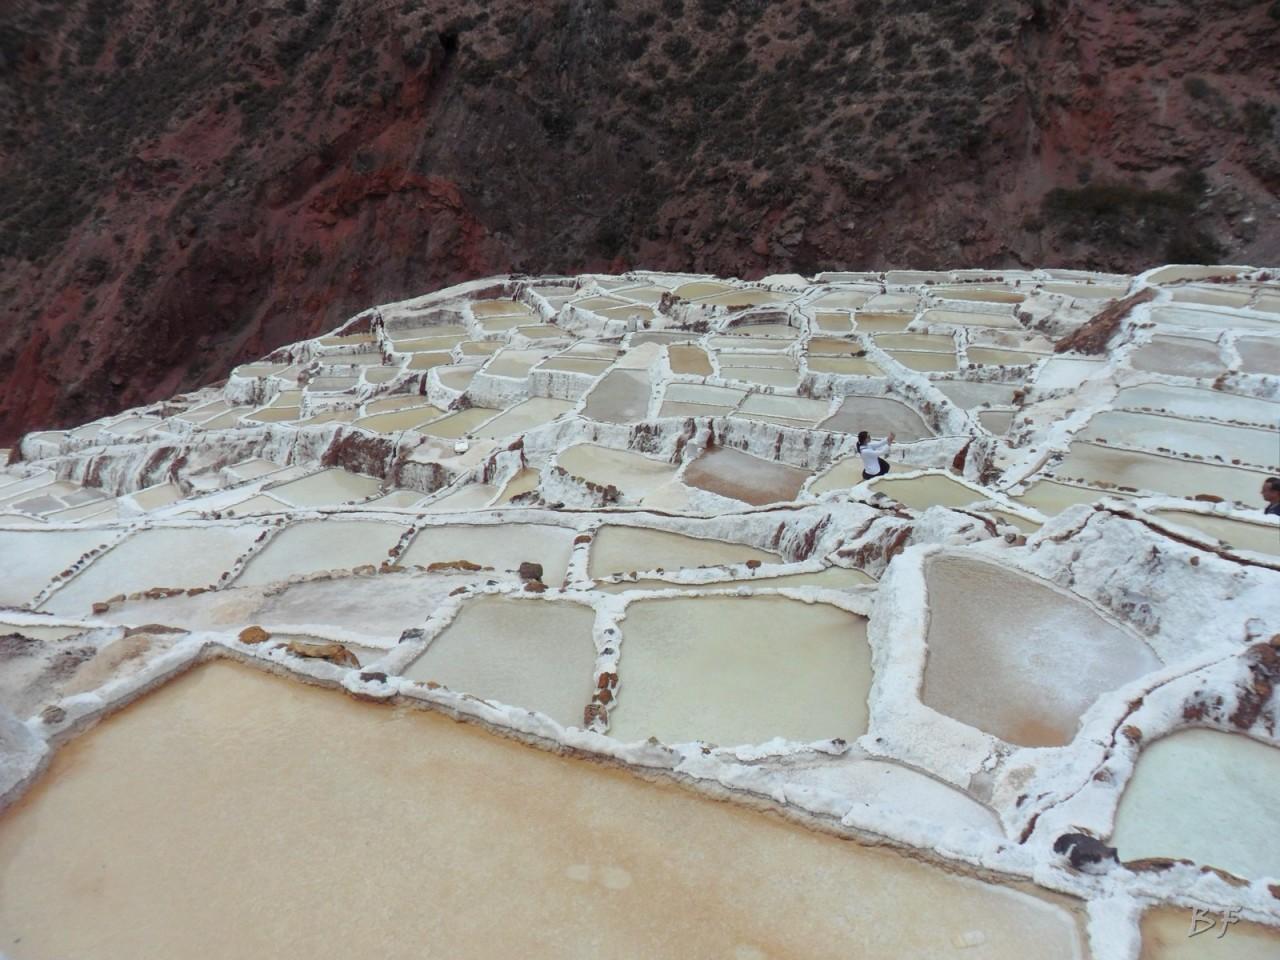 Terrazze-Circolari-Megaliti-Moray-Saline-Maras-Cusco-Perù-17